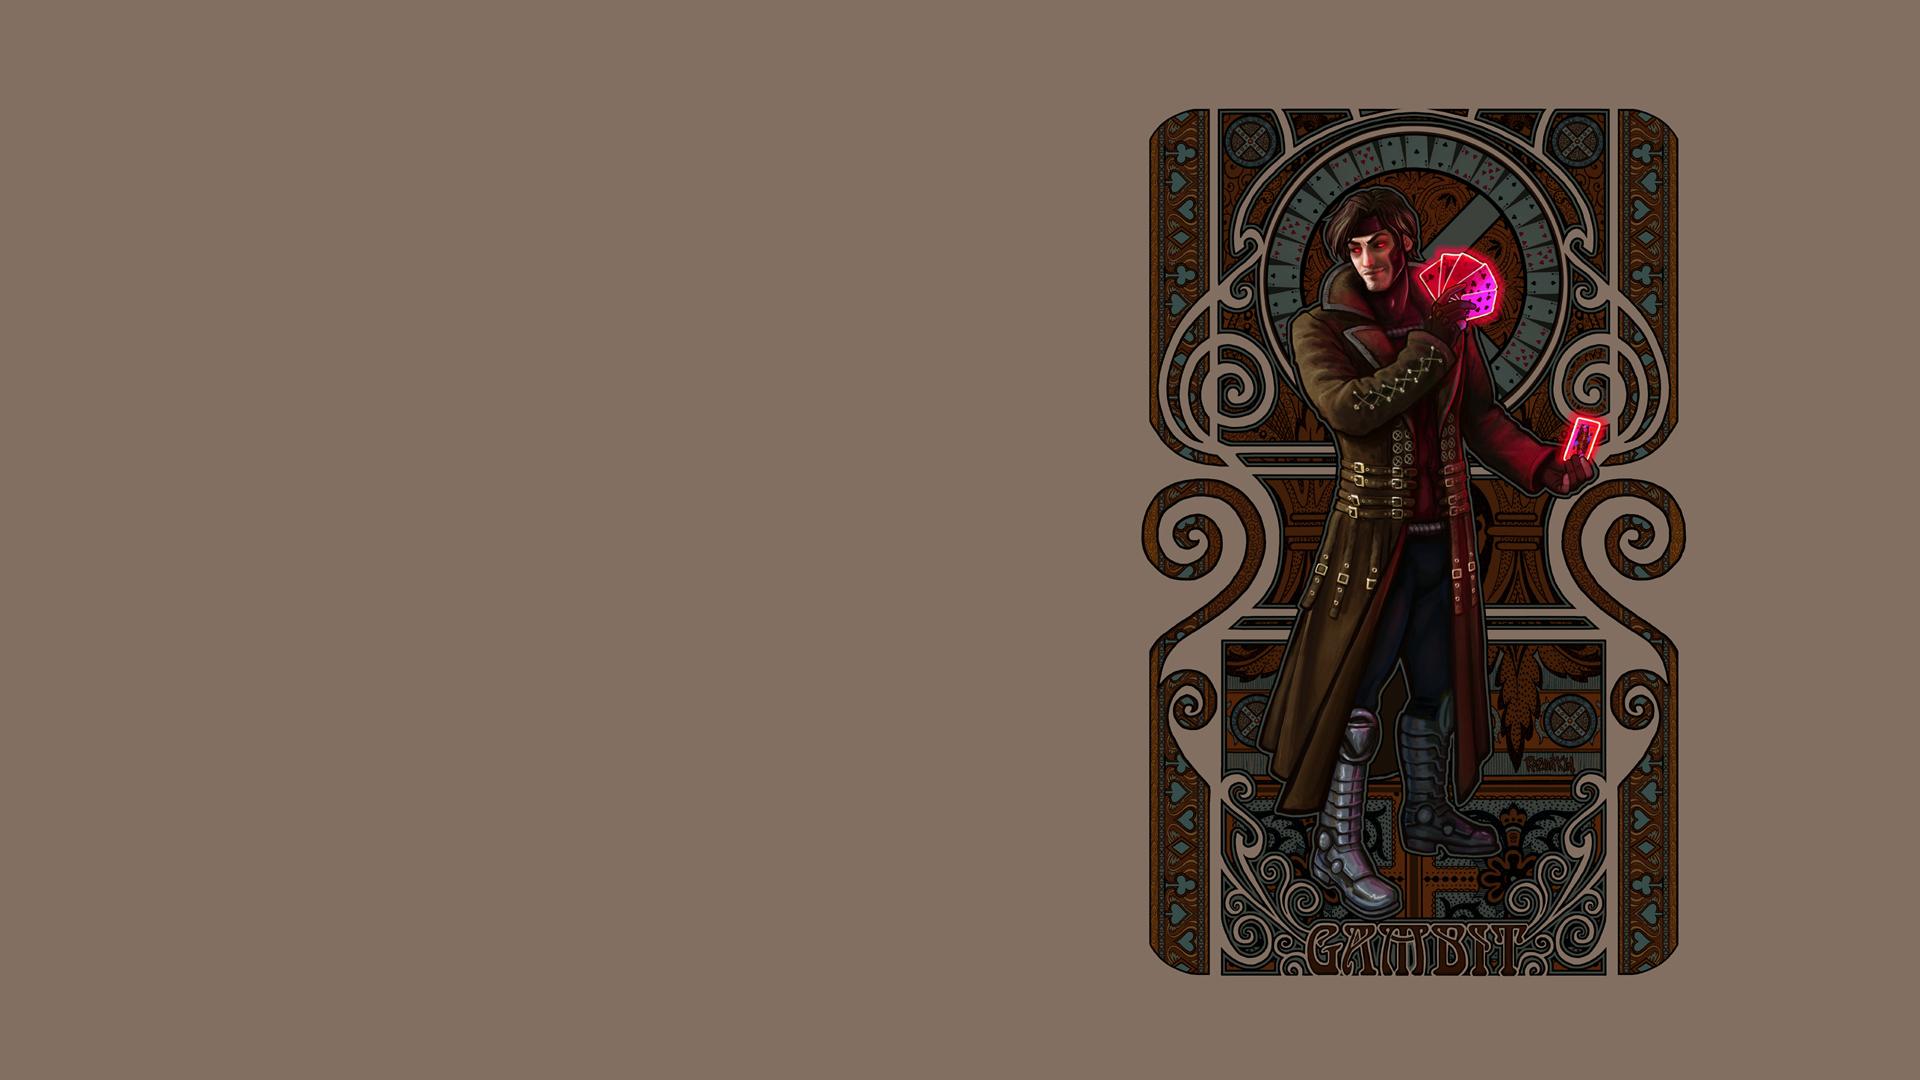 gambit guardians wallpaper 1920x1080 - photo #26